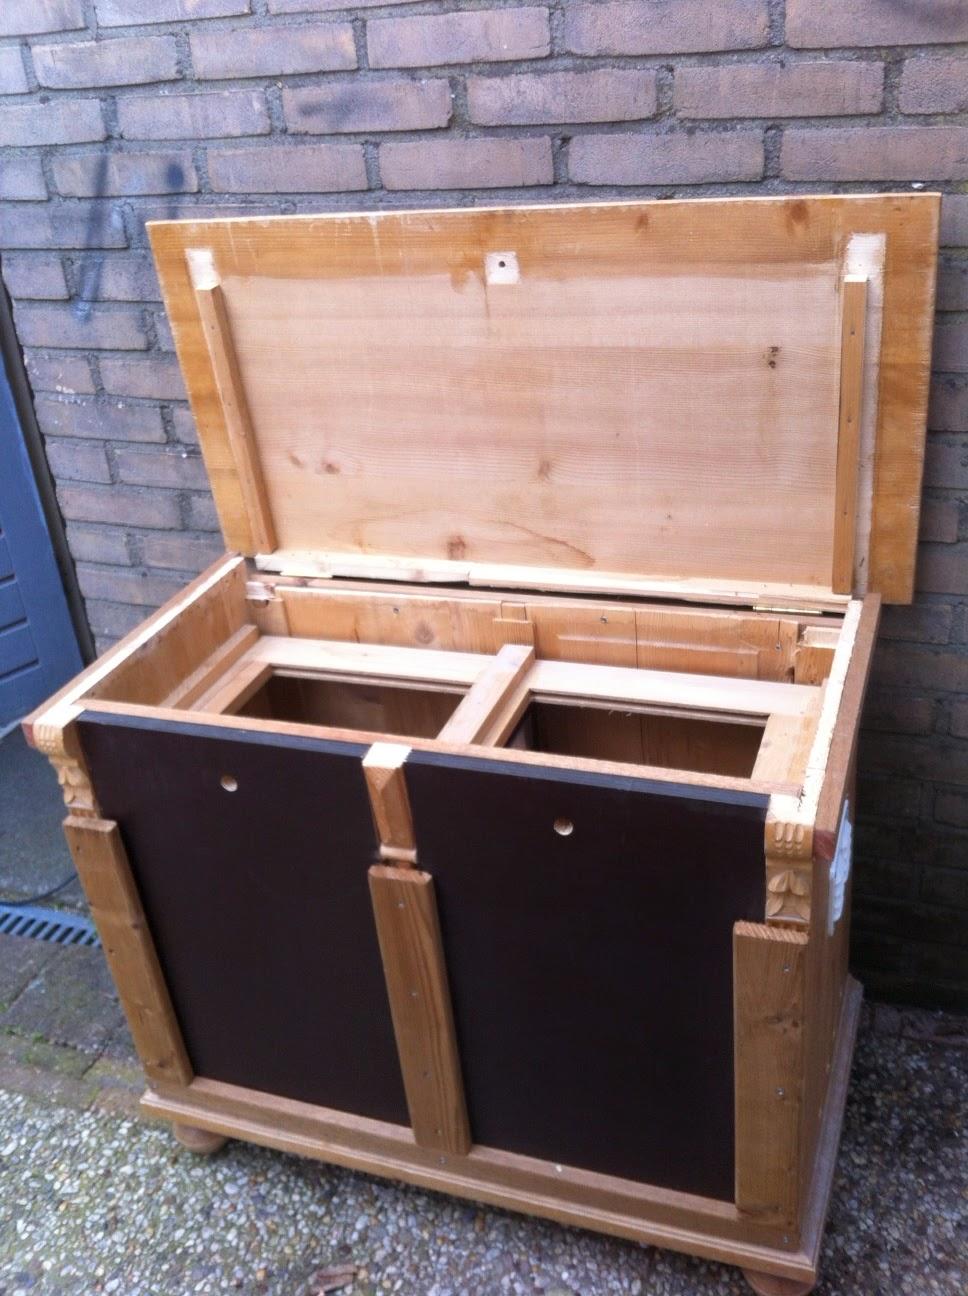 Le Compostier: Le Compostier Locale, uw afval wordt uw voedsel